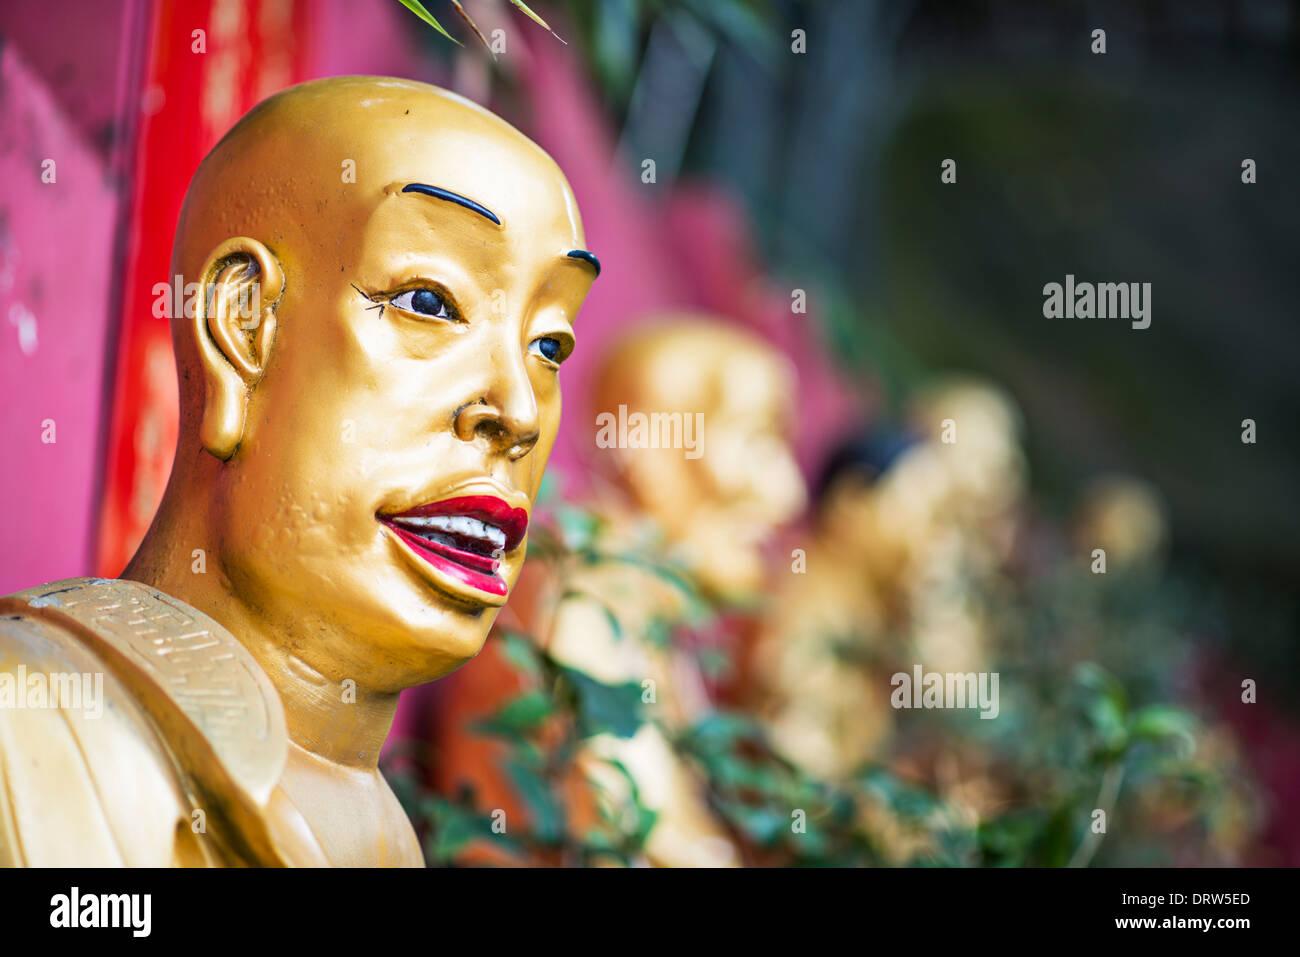 Buddha-Statue in zehn tausend Buddhas Kloster in Hong Kong, China. Stockbild